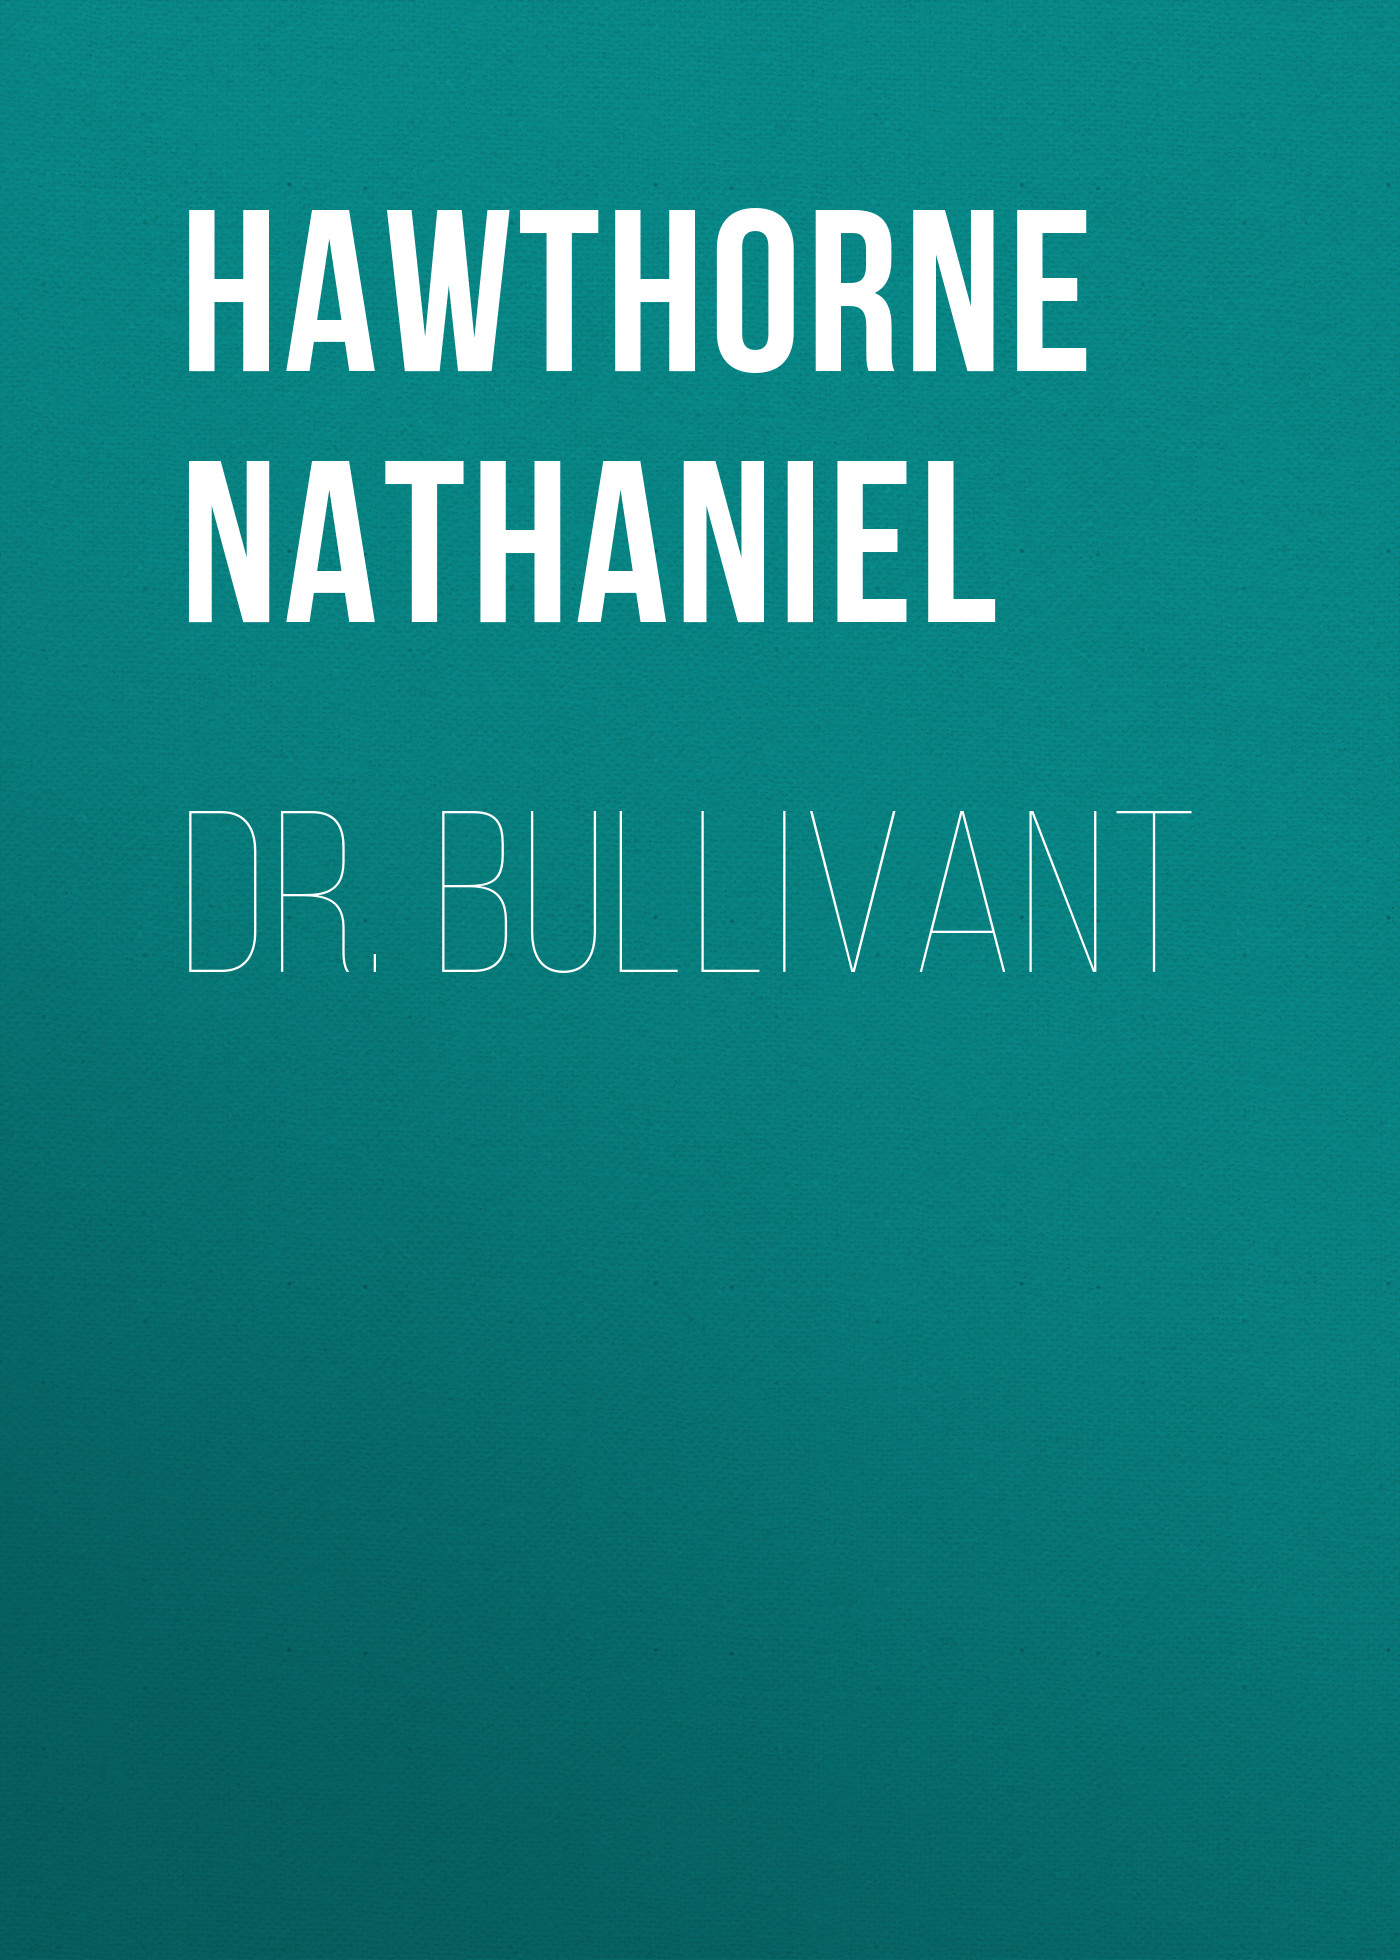 Hawthorne Nathaniel Dr. Bullivant hawthorne nathaniel dr bullivant